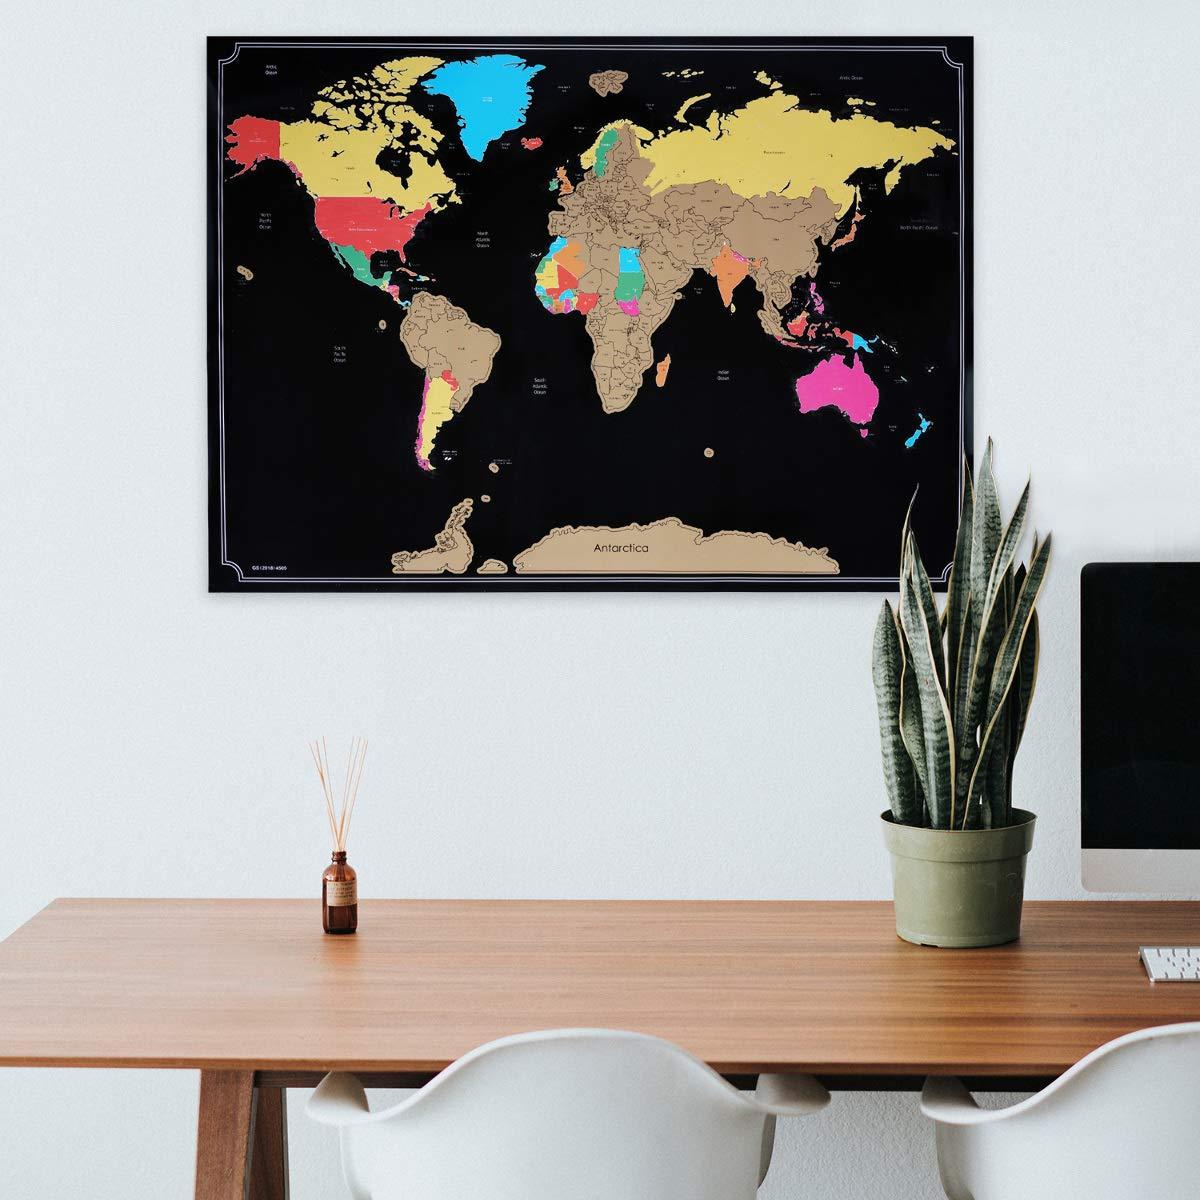 Navaris Scratch Off Μεγάλη Αφίσα με τον Παγκόσμιο Χάρτη Περιλαμβάνει την Ξύστρα 82 x 59 cm Black 47795.01